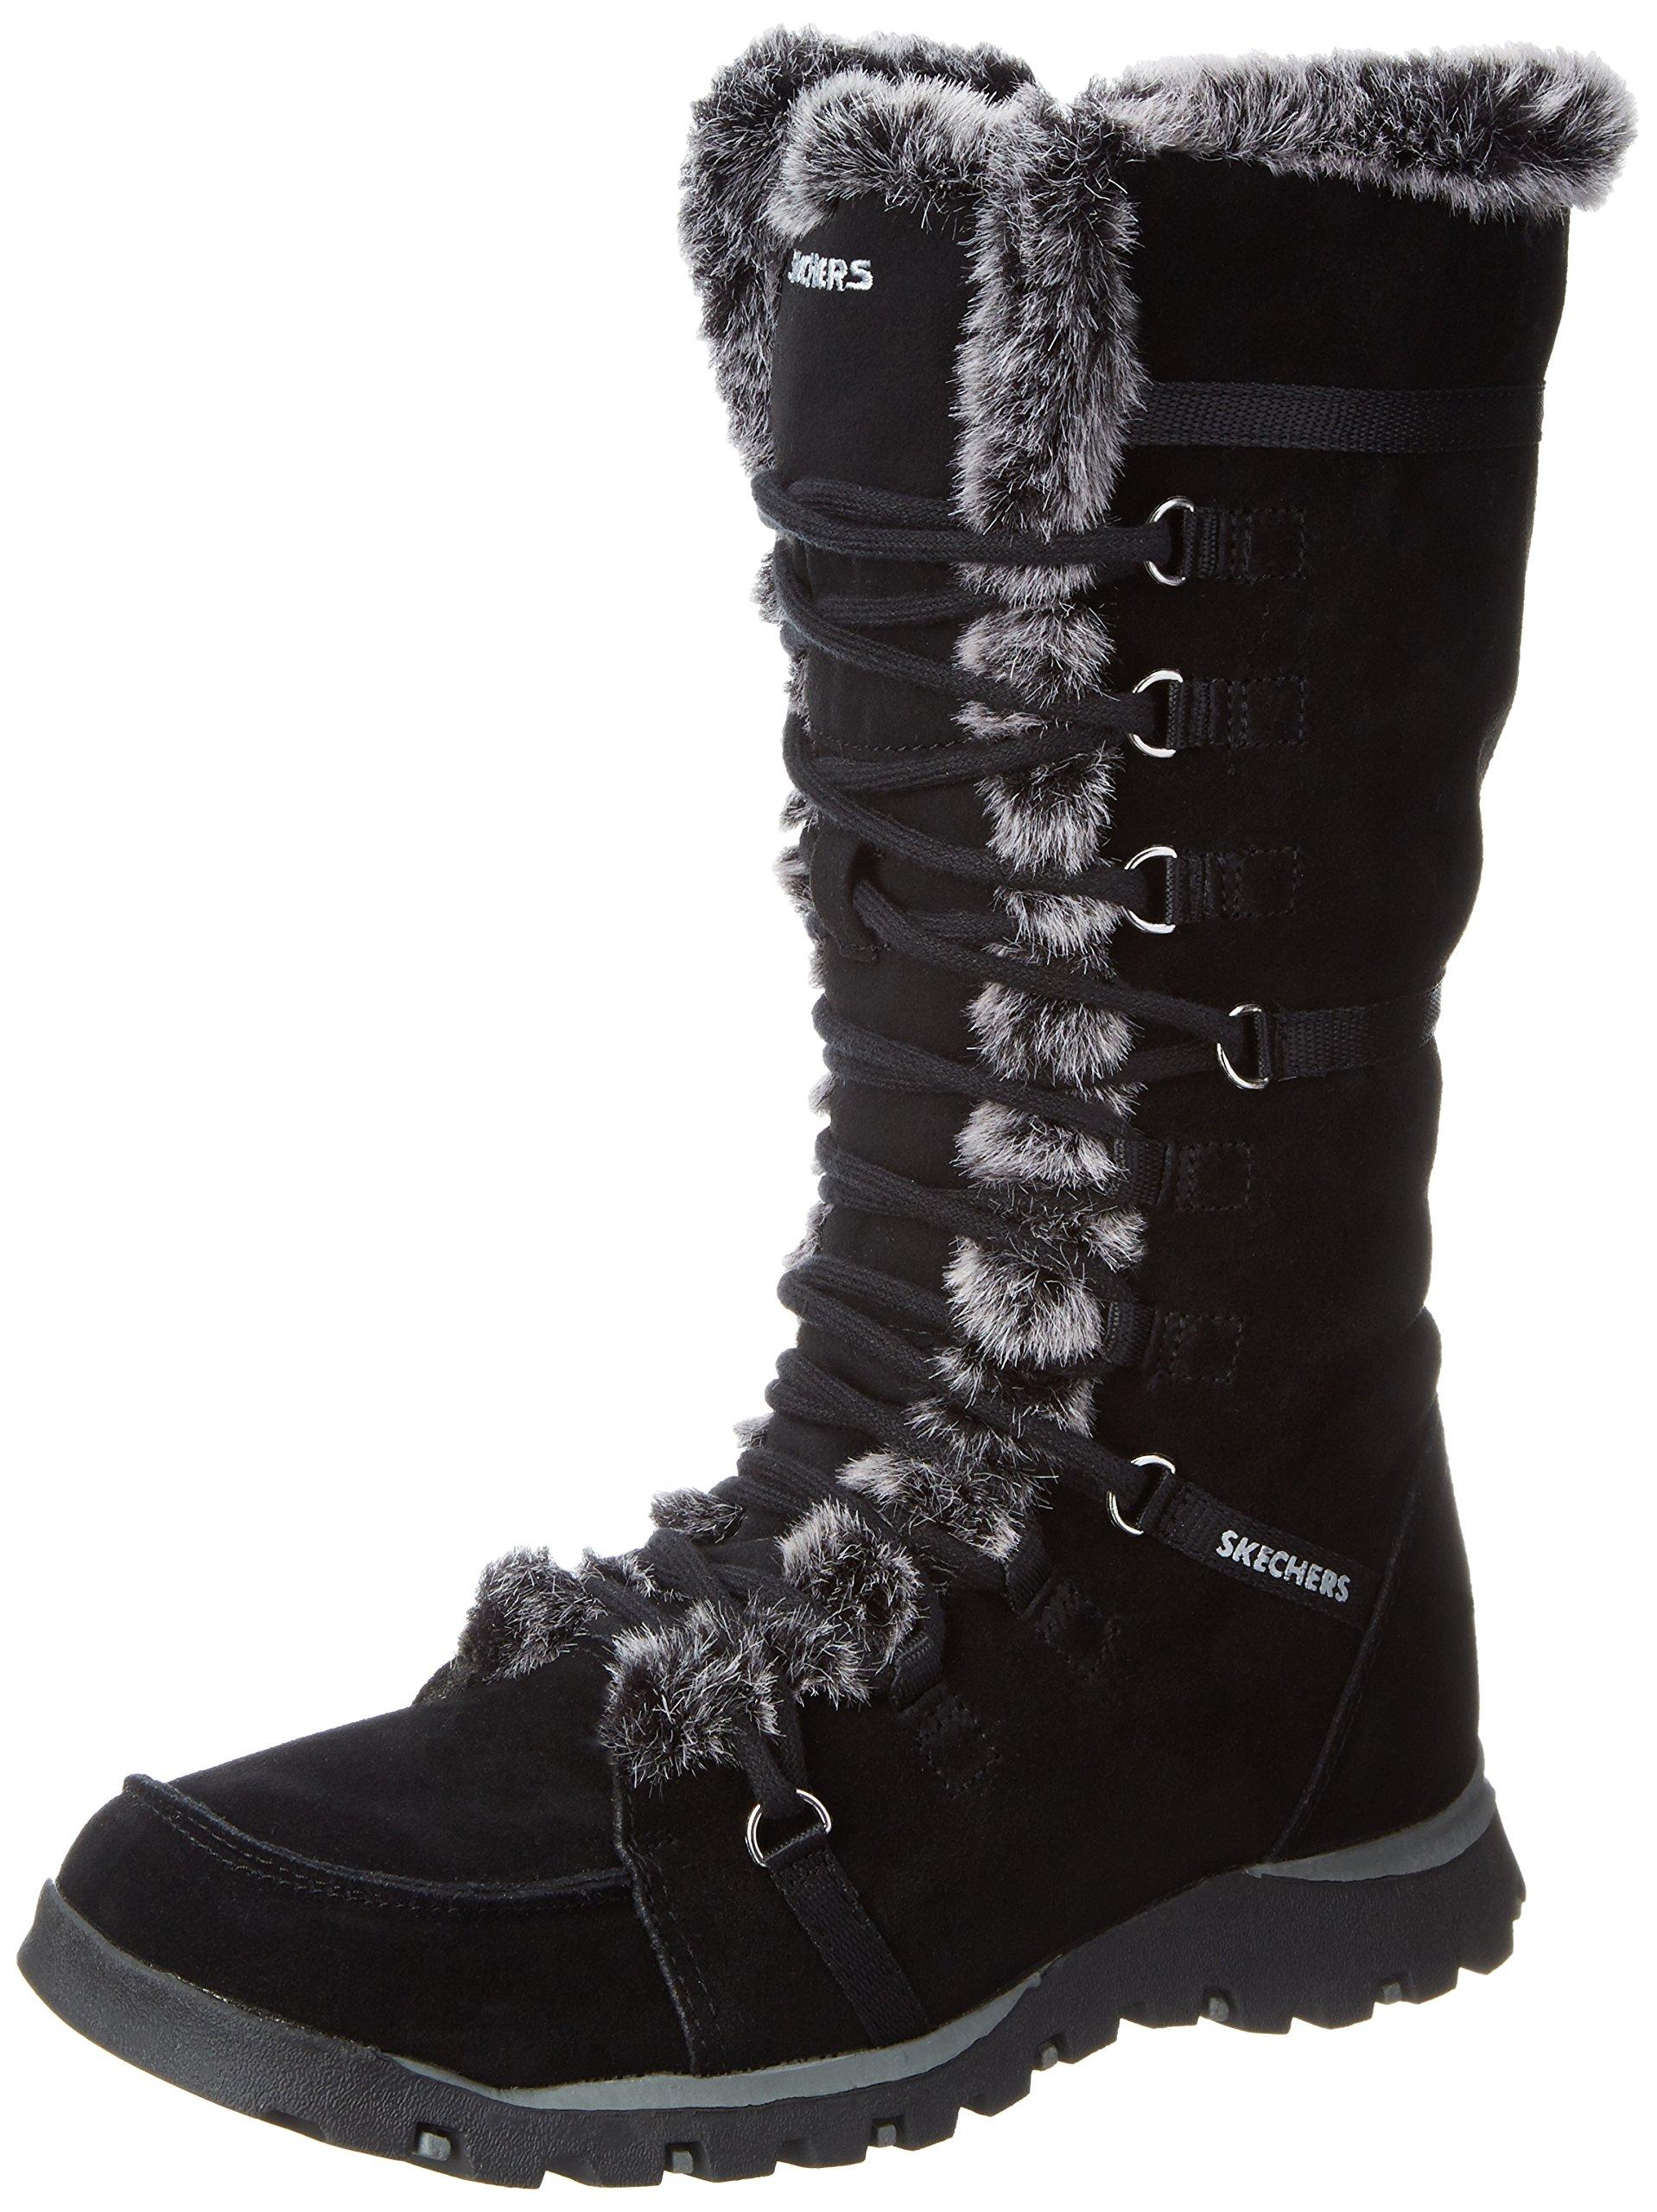 Skechers Women's Grand Jams Unlimited Boot,Black,8.5 M